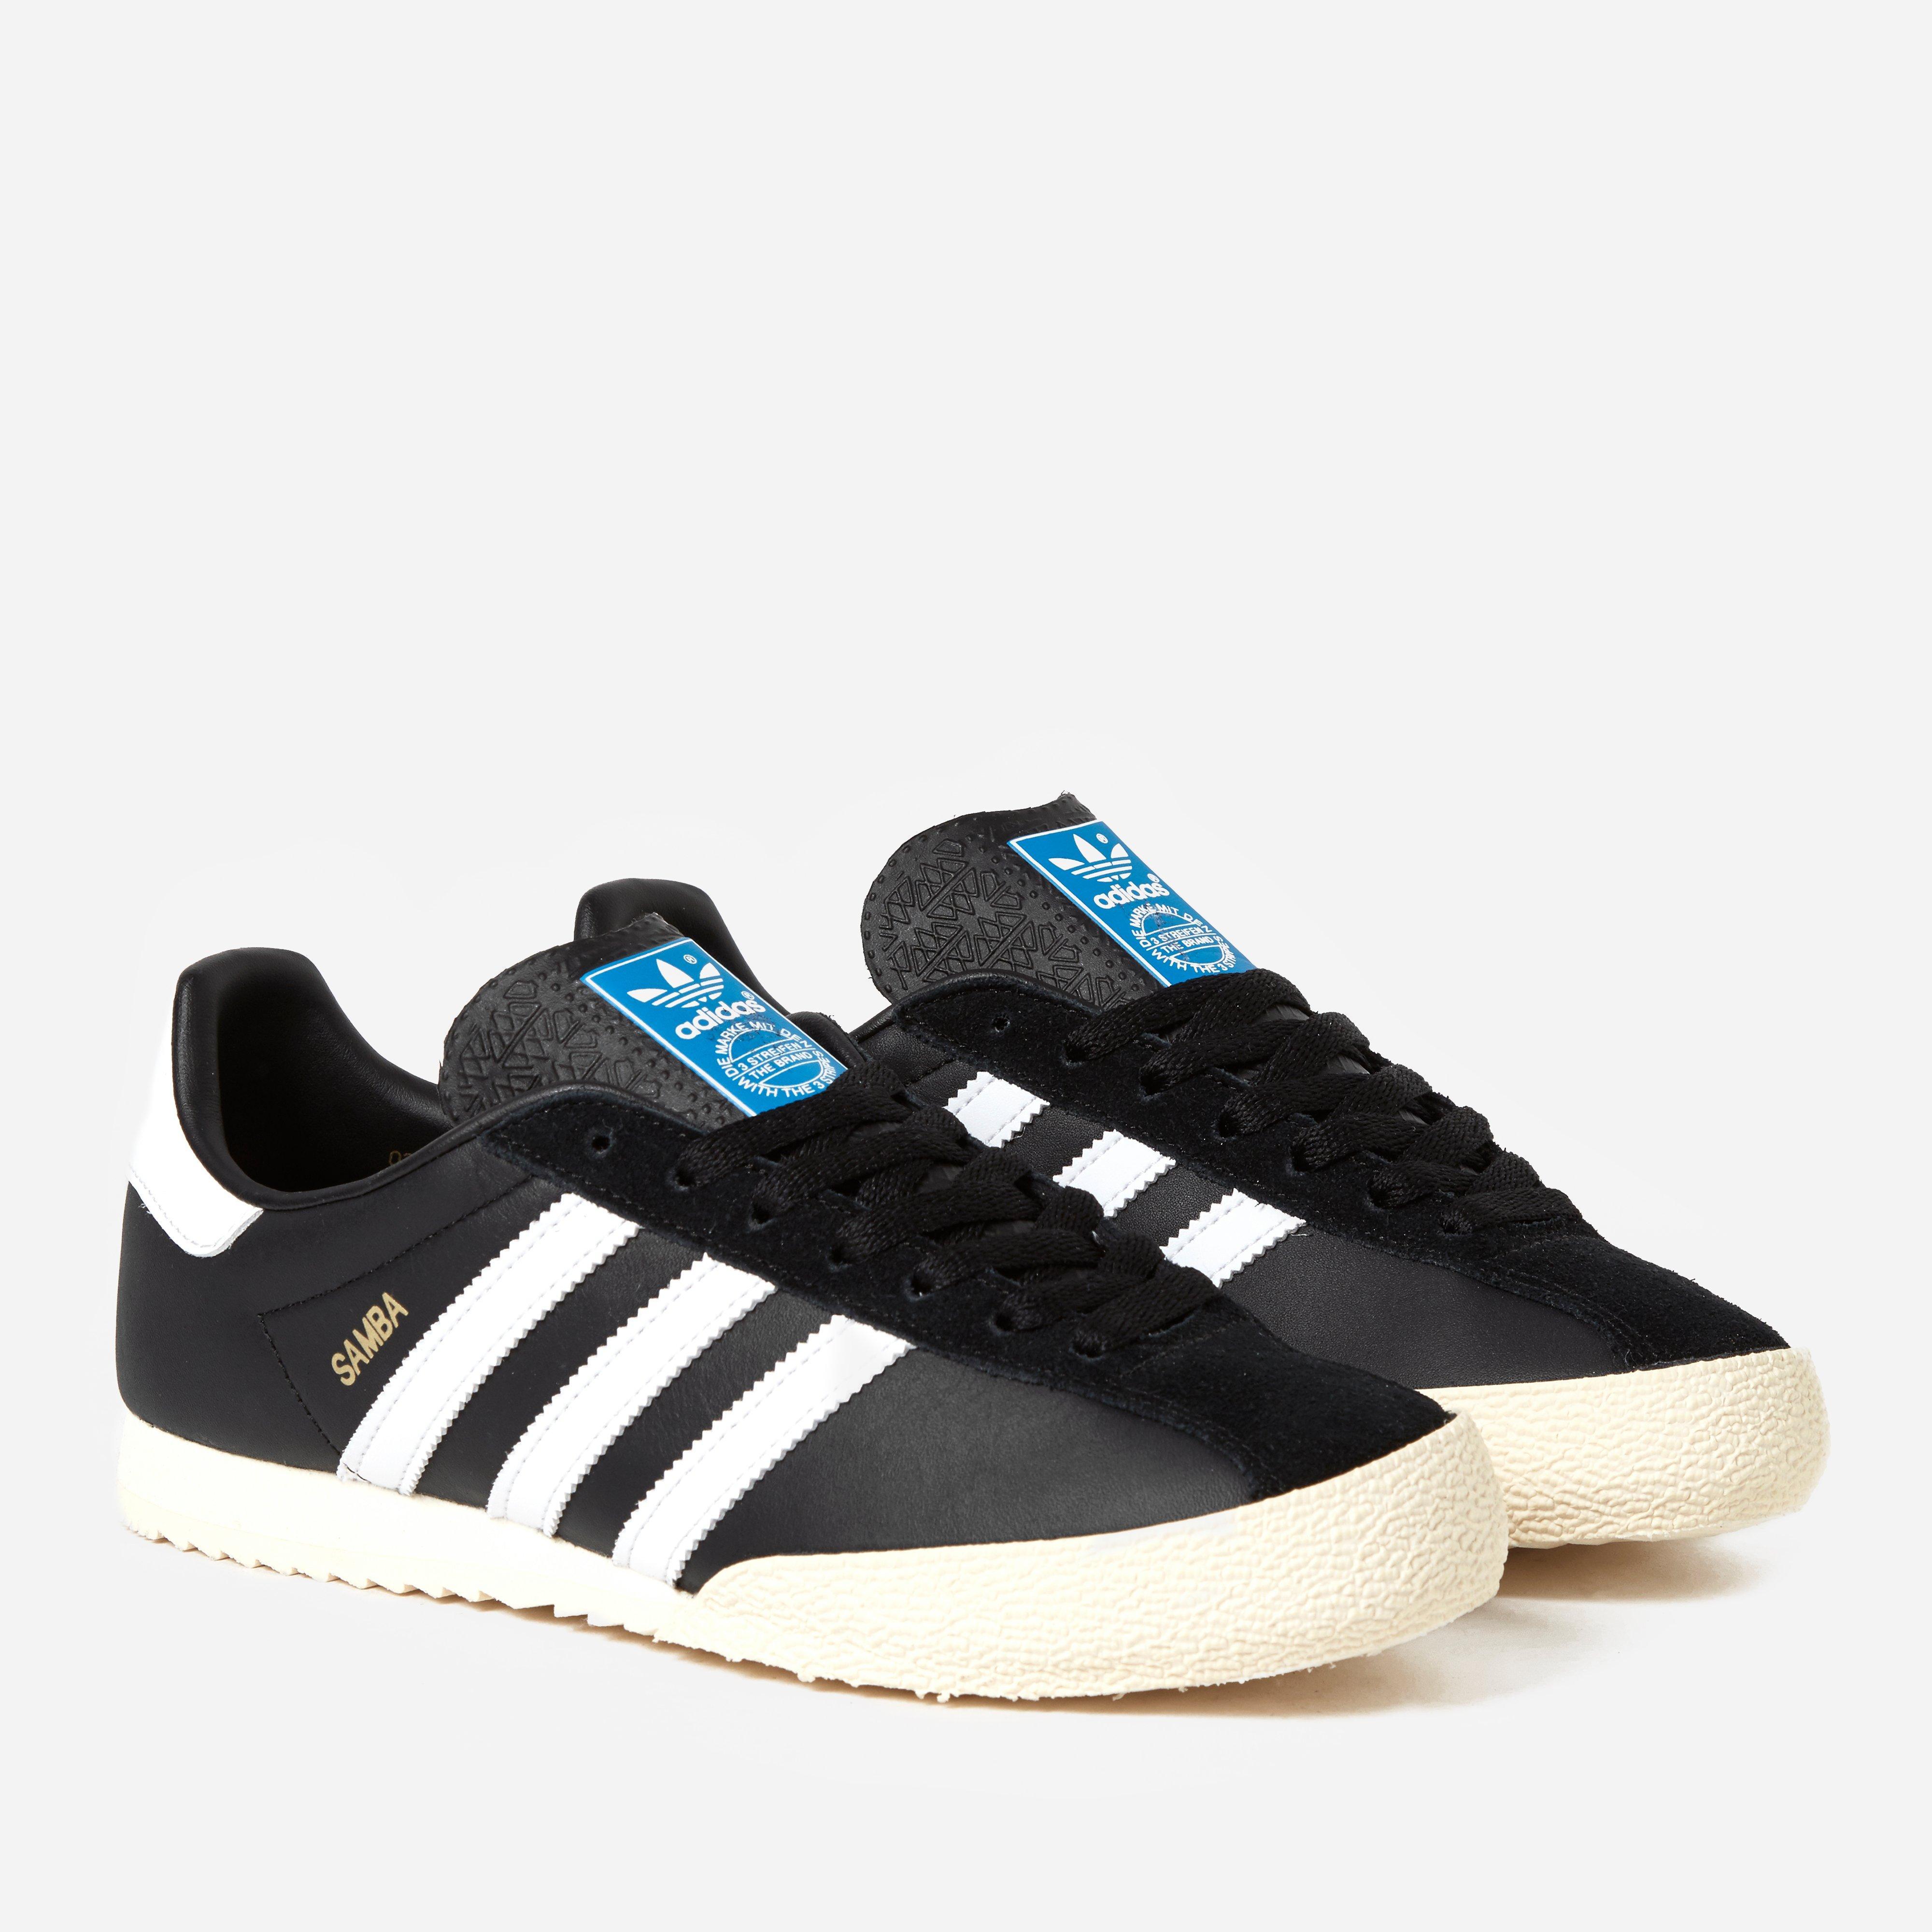 adidas Originals Spezial Samba SPZL